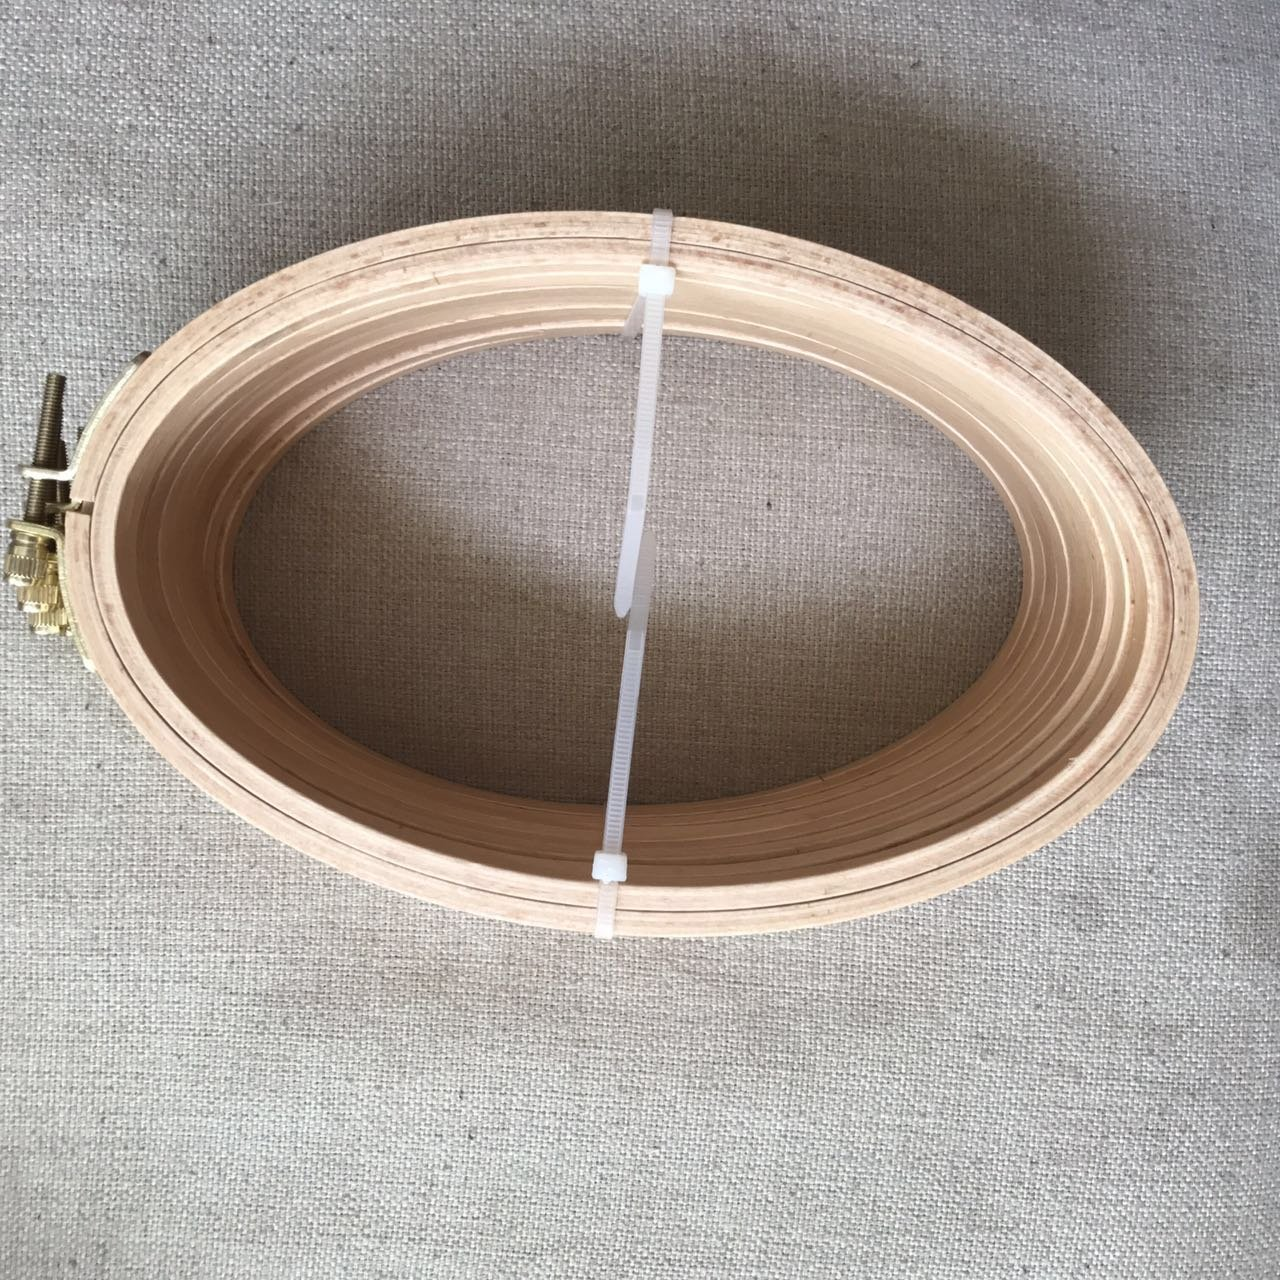 Stitchery Hoop Framing Hoop womei wm2113 Cross Stitch Hoop 2PCS//Pack Craft Supply Hoop WRMHOM8.27x 5.12 Oval Wooden Embroidery Hoop 21x 13cm Oval Hand Stitching Hoop